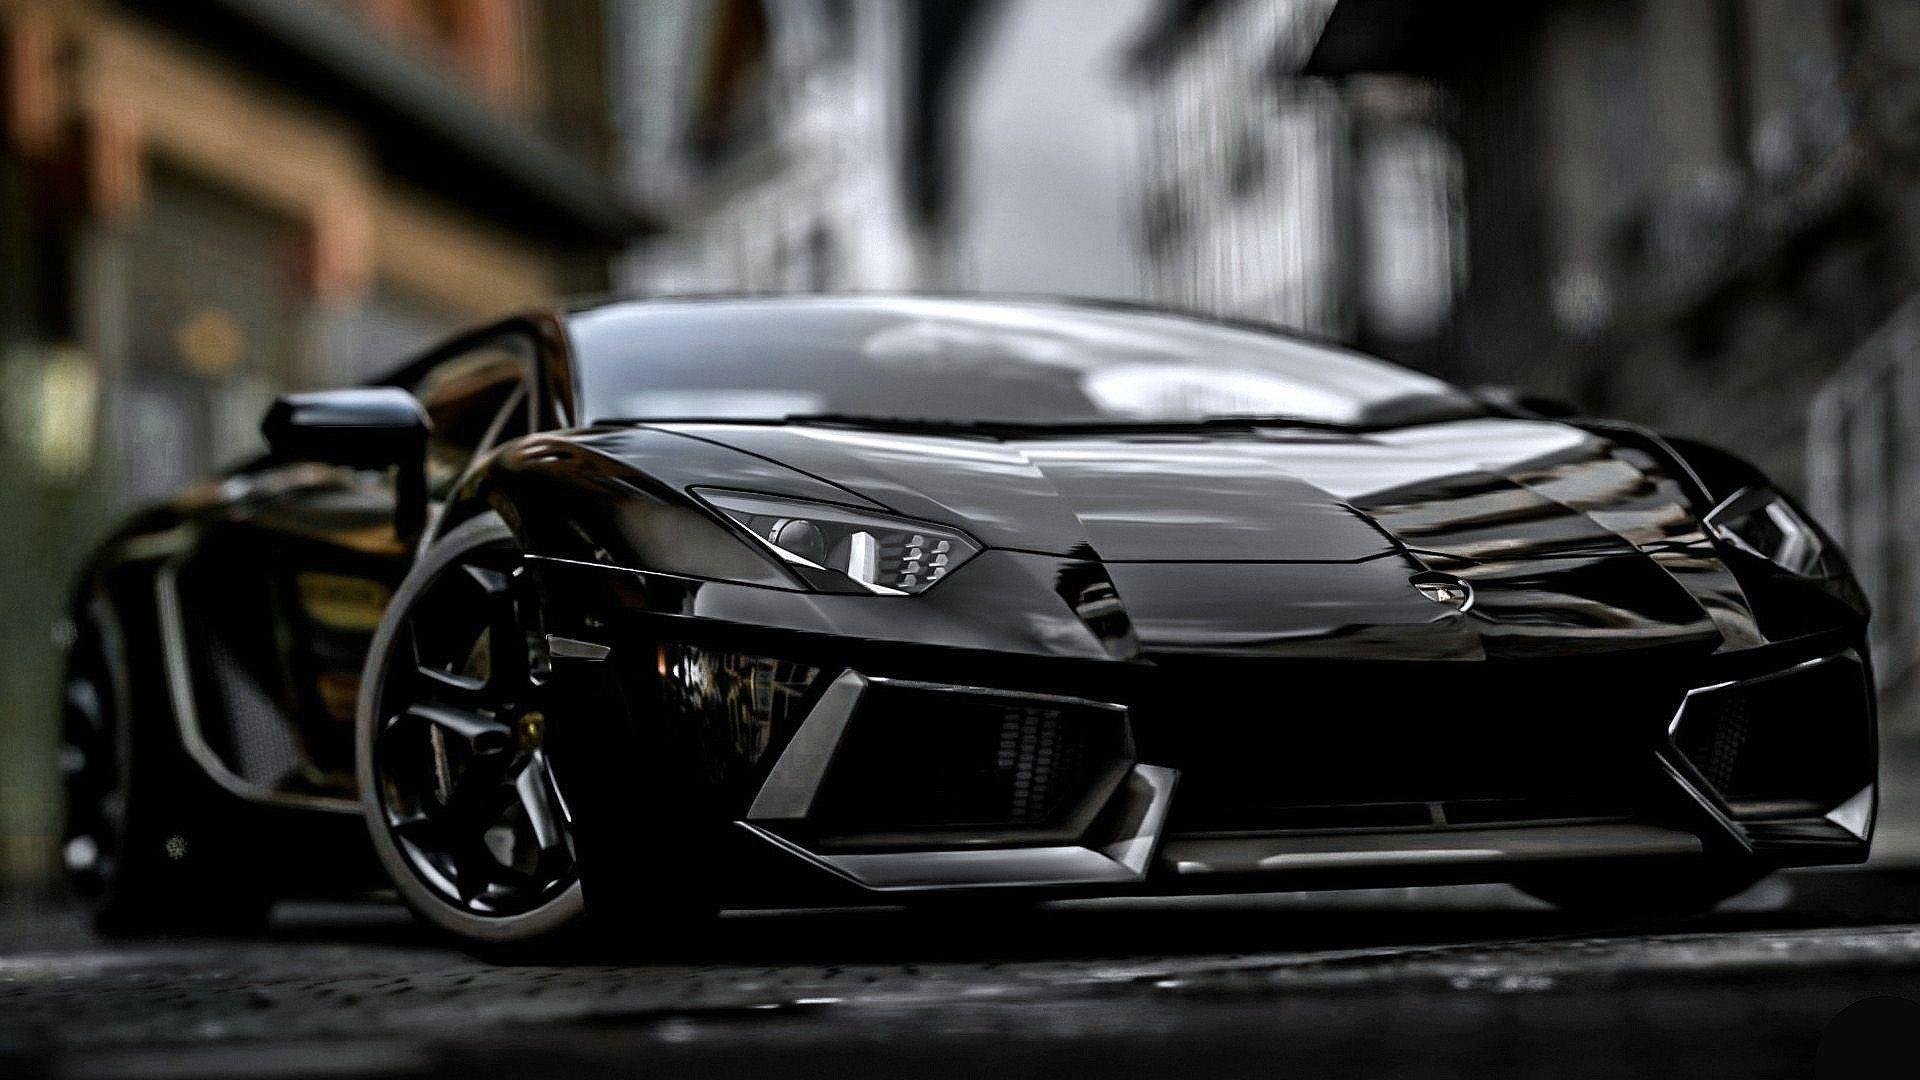 Lamborghini wallpaper 1080p 74 pictures for 1080p 1920x1080